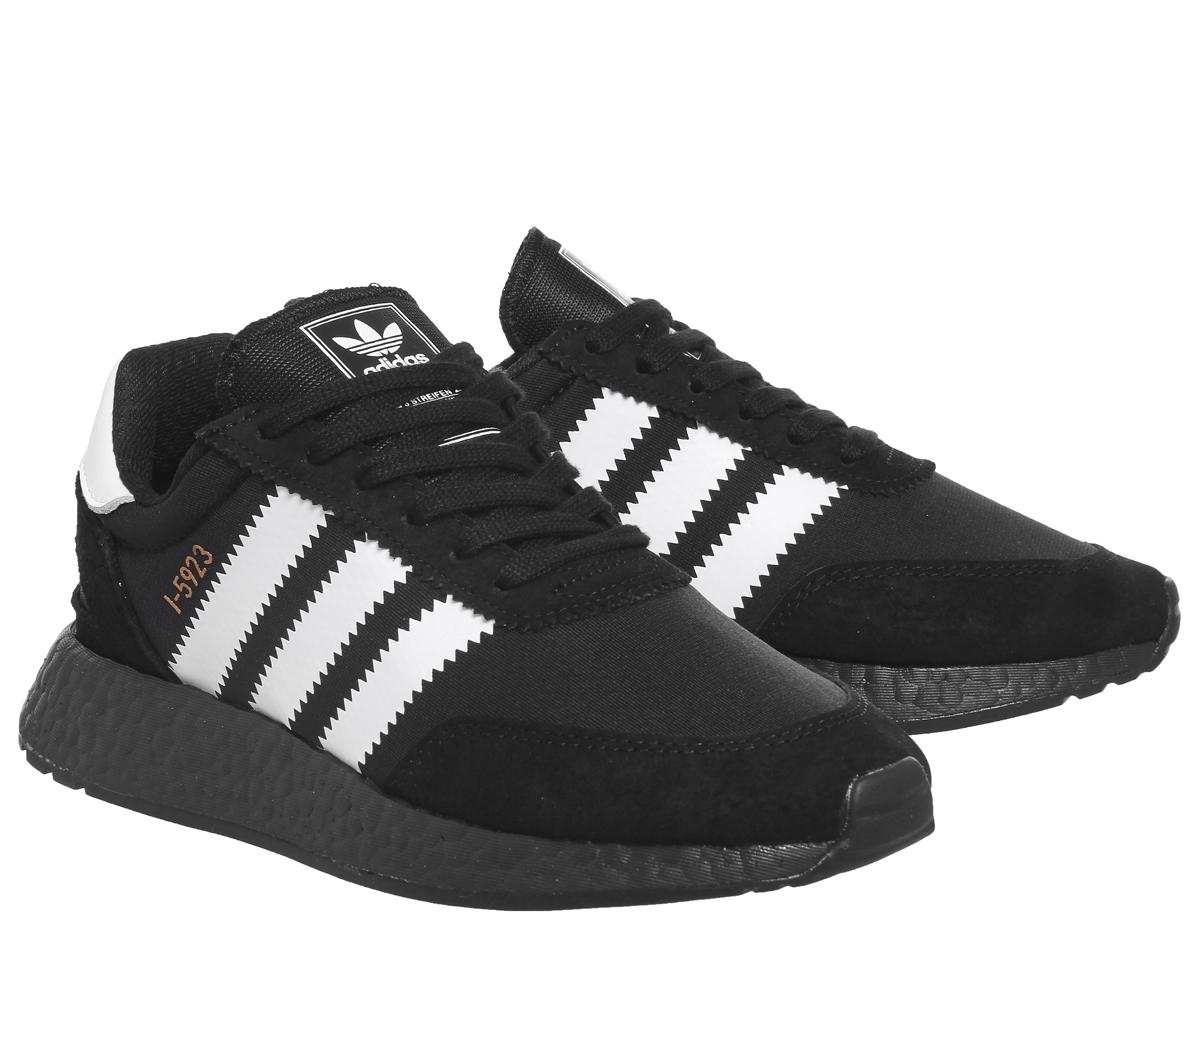 c0d5a8ea5f7c1 Mens Adidas I-5923 Trainers BLACK WHITE COPPER Trainers Shoes